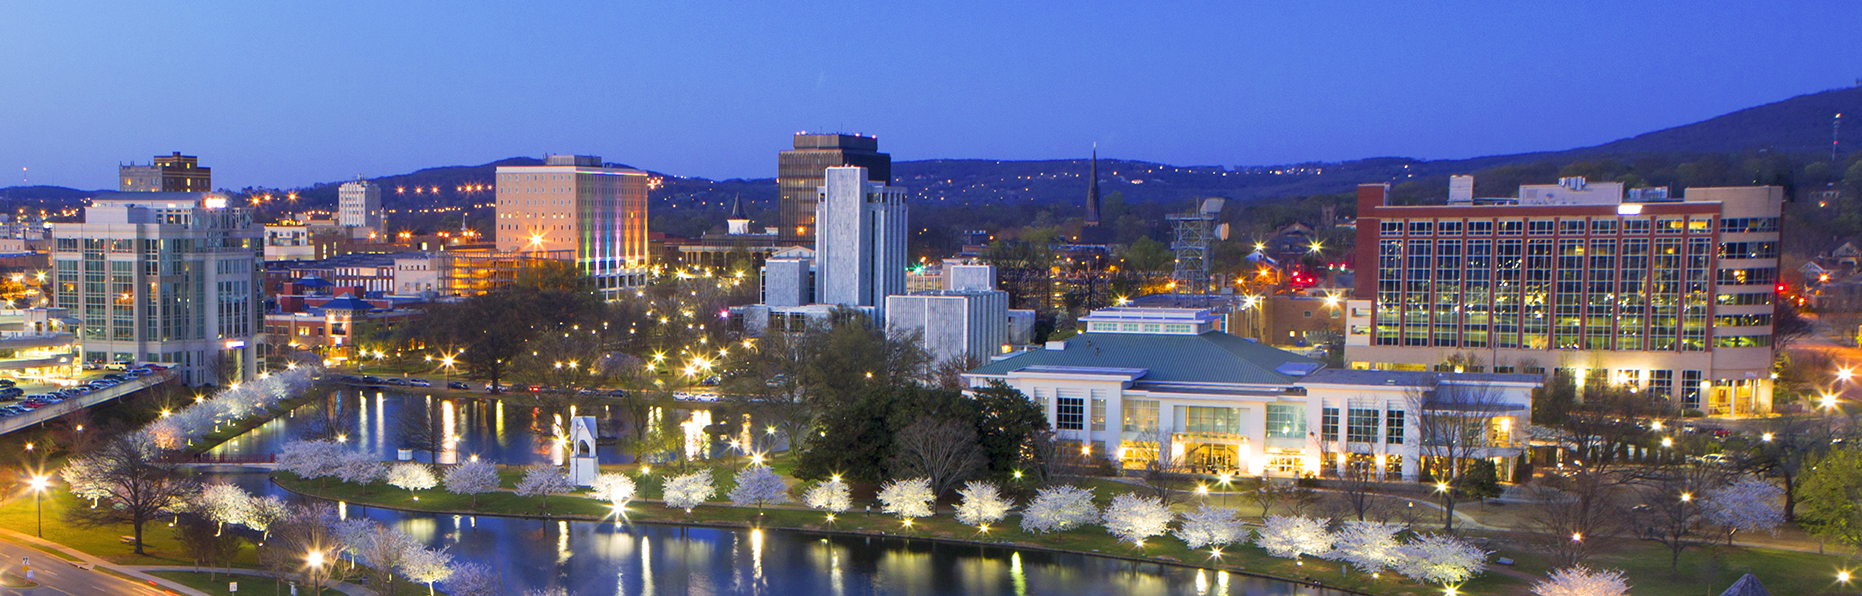 Huntsville/Madison, AL #4614